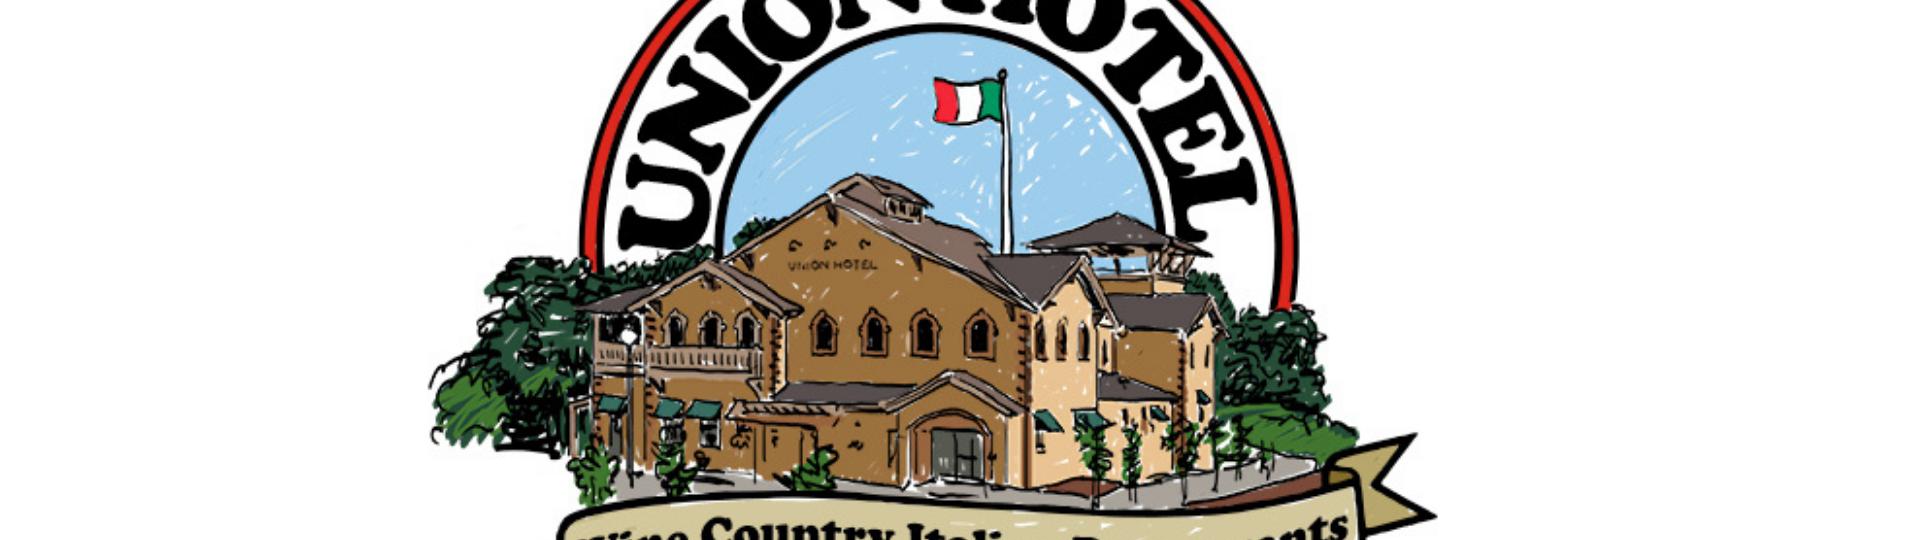 union hotel. wine country italian restaurants. established in occidental 1879